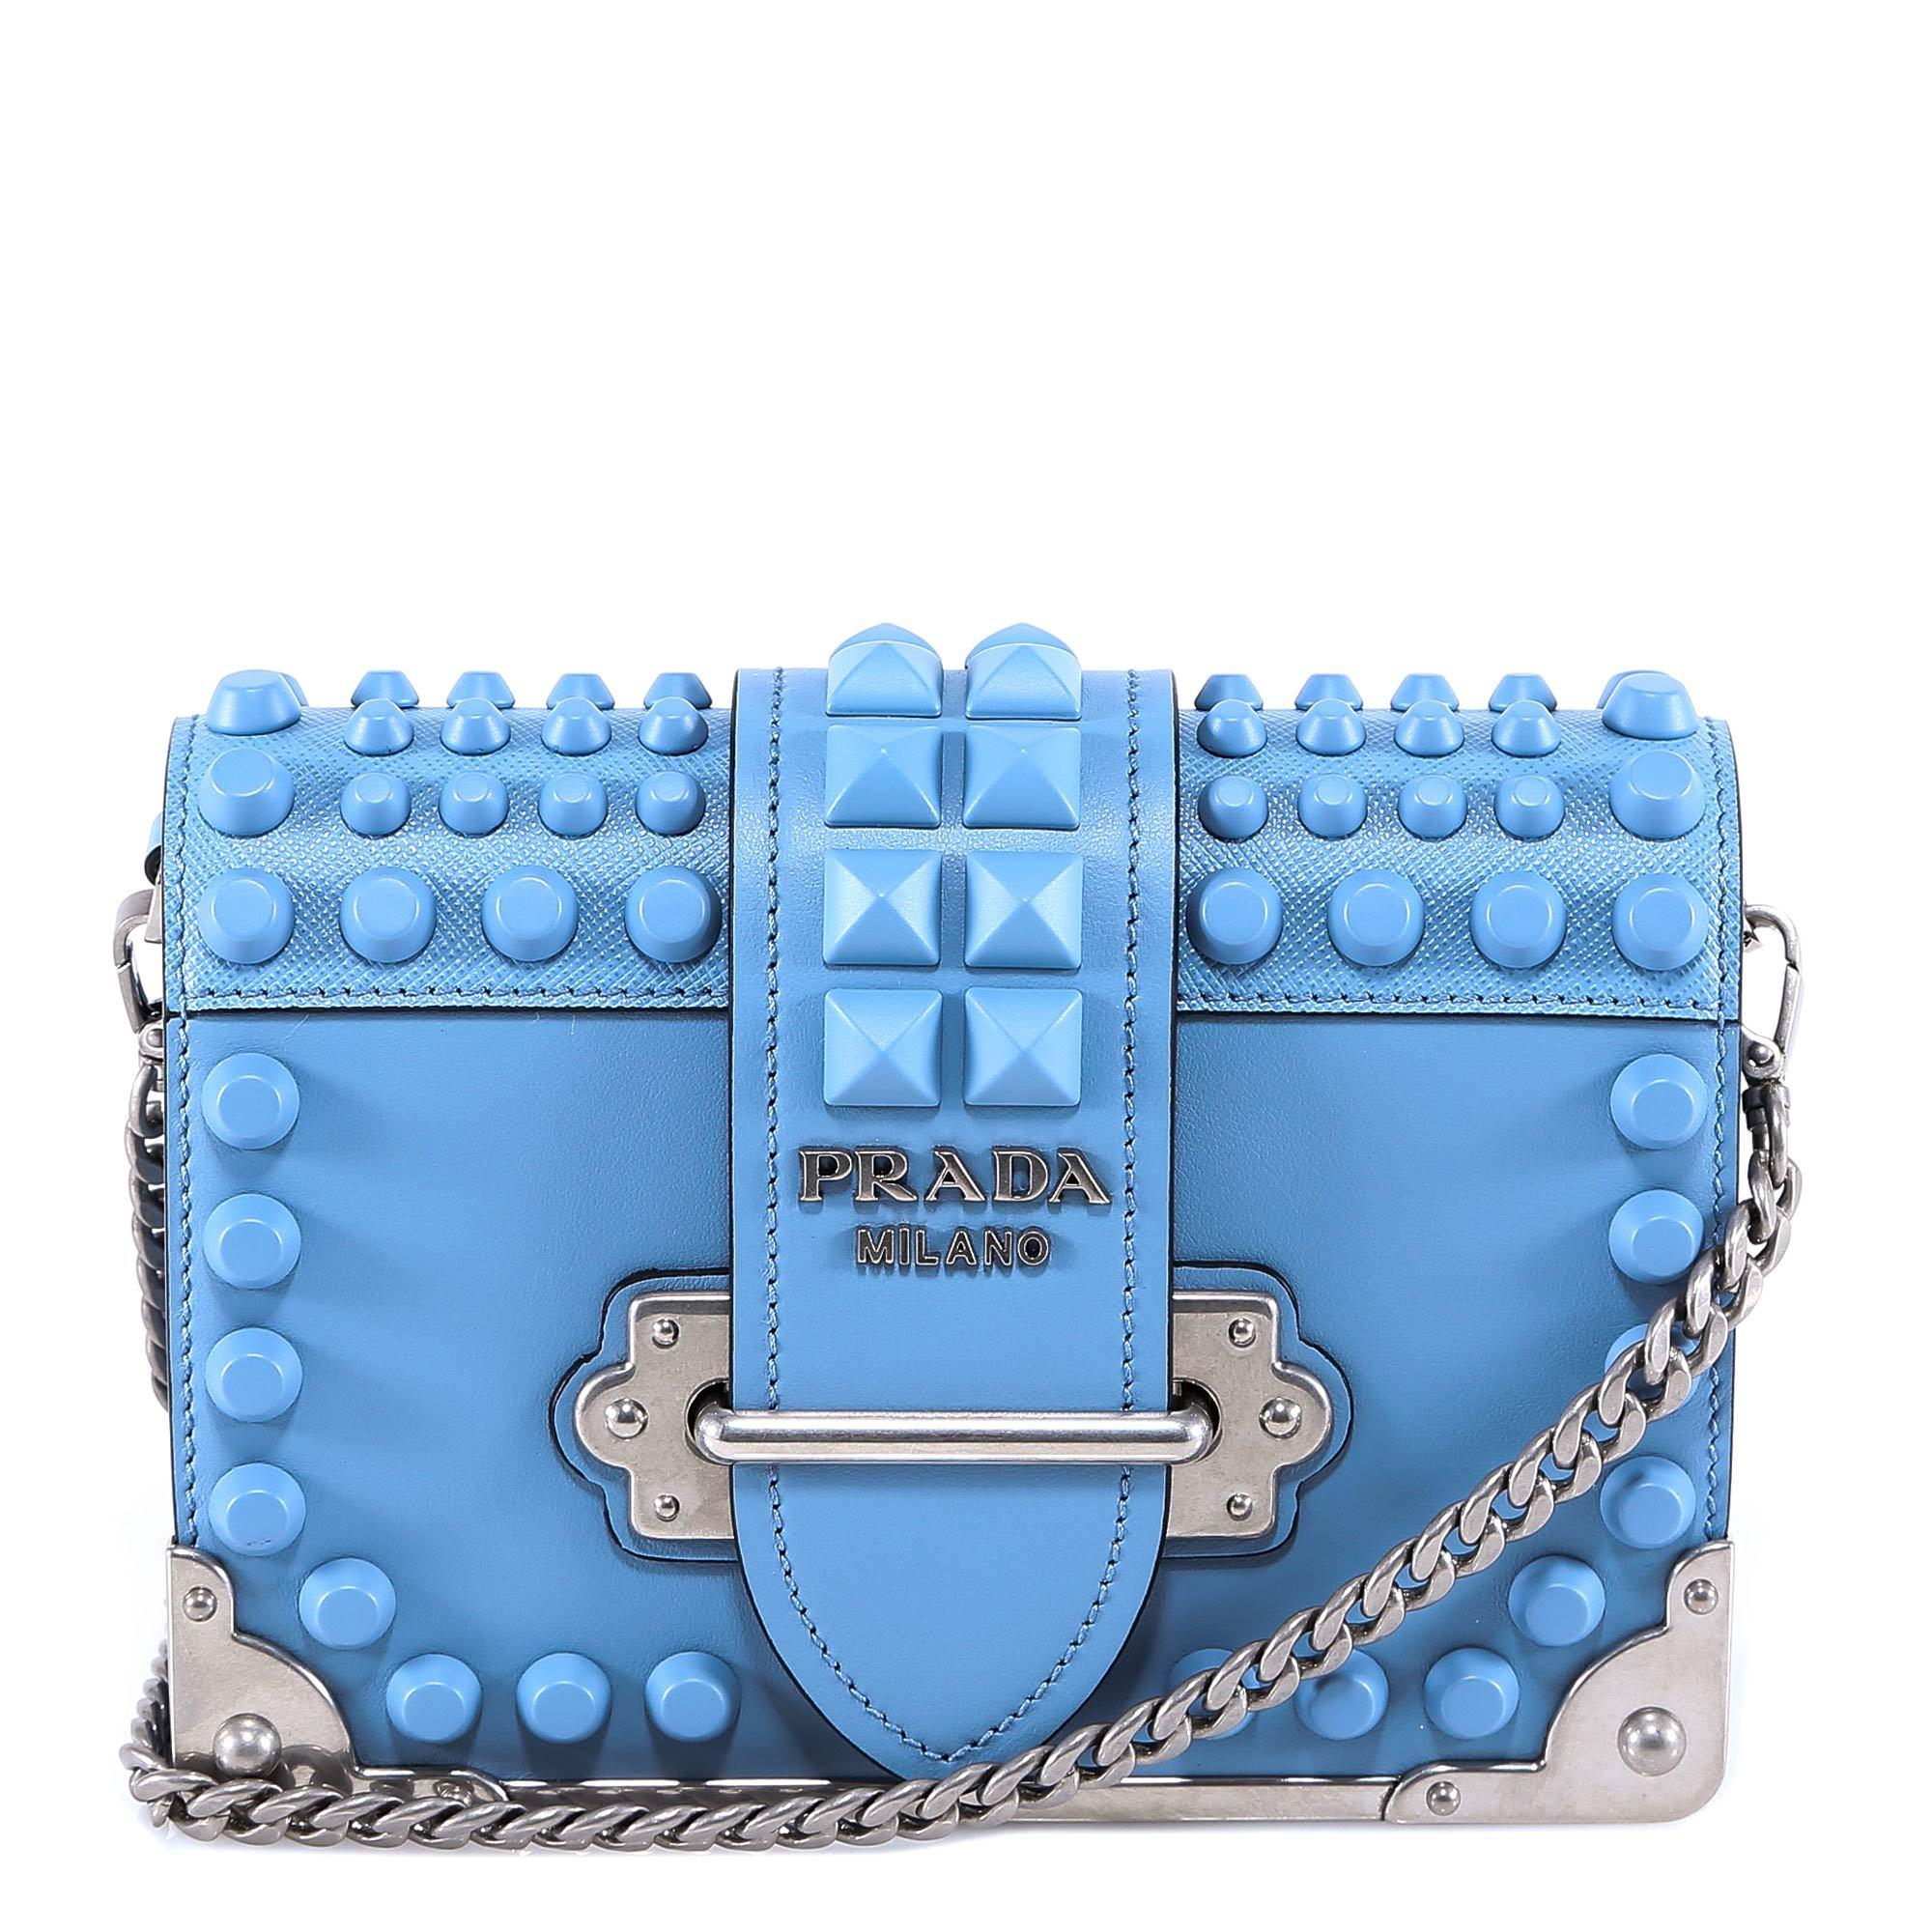 a58df221a79a Prada Cahier Shoulder Bag In Blue. CETTIRE